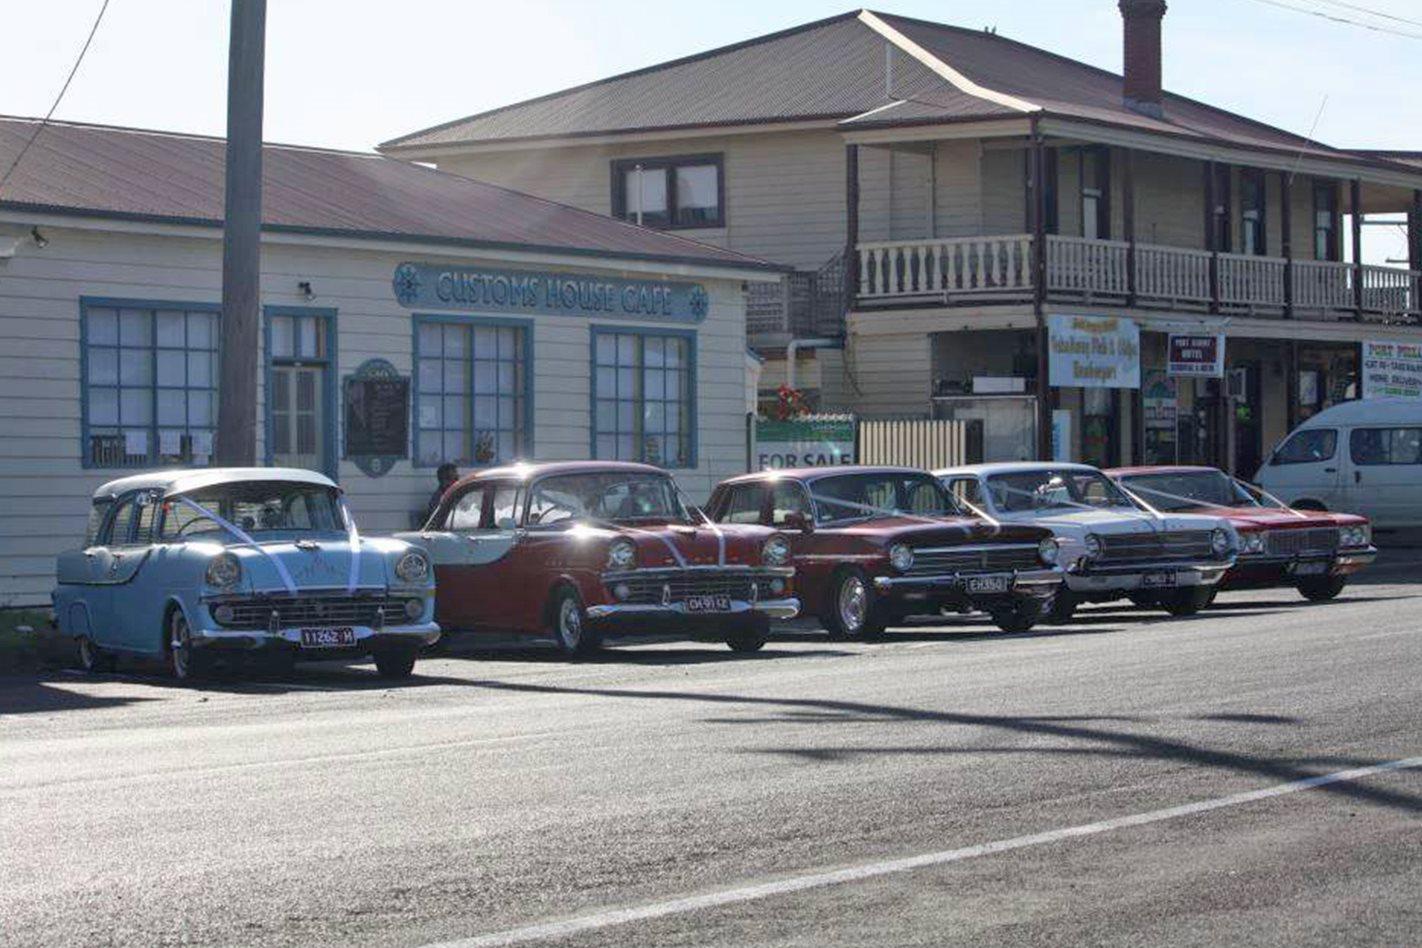 Daryl Hearn's wedding cars